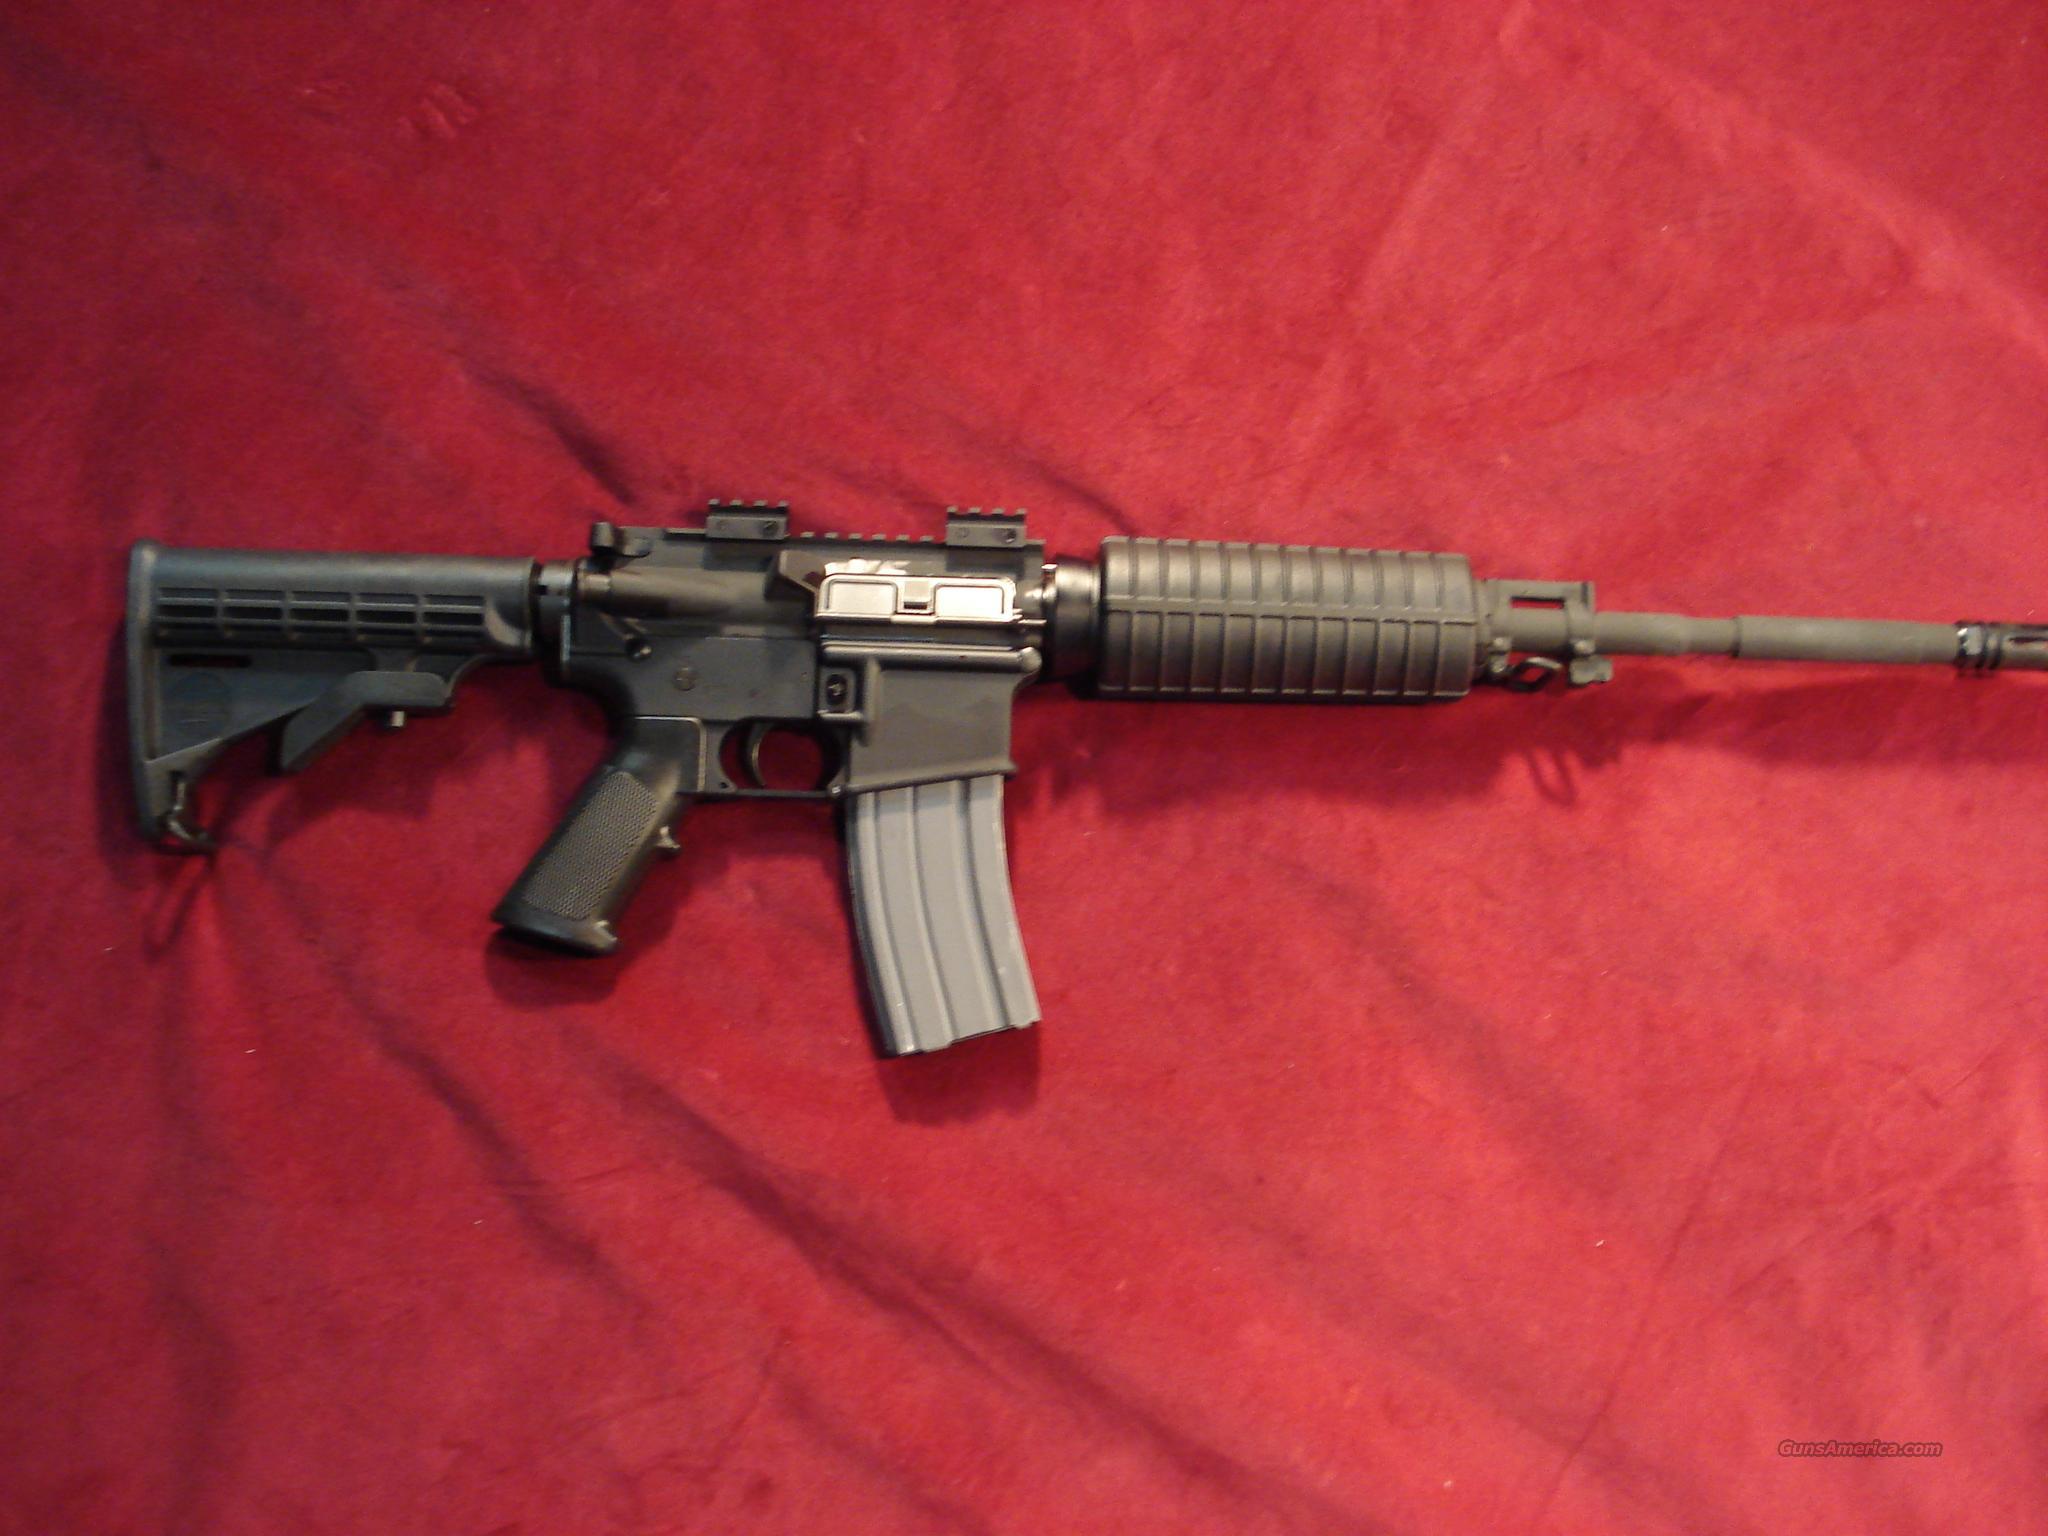 BUSHMASTER M4 O.R.C. ( OPTIC READY CARBINE) NEW... for sale